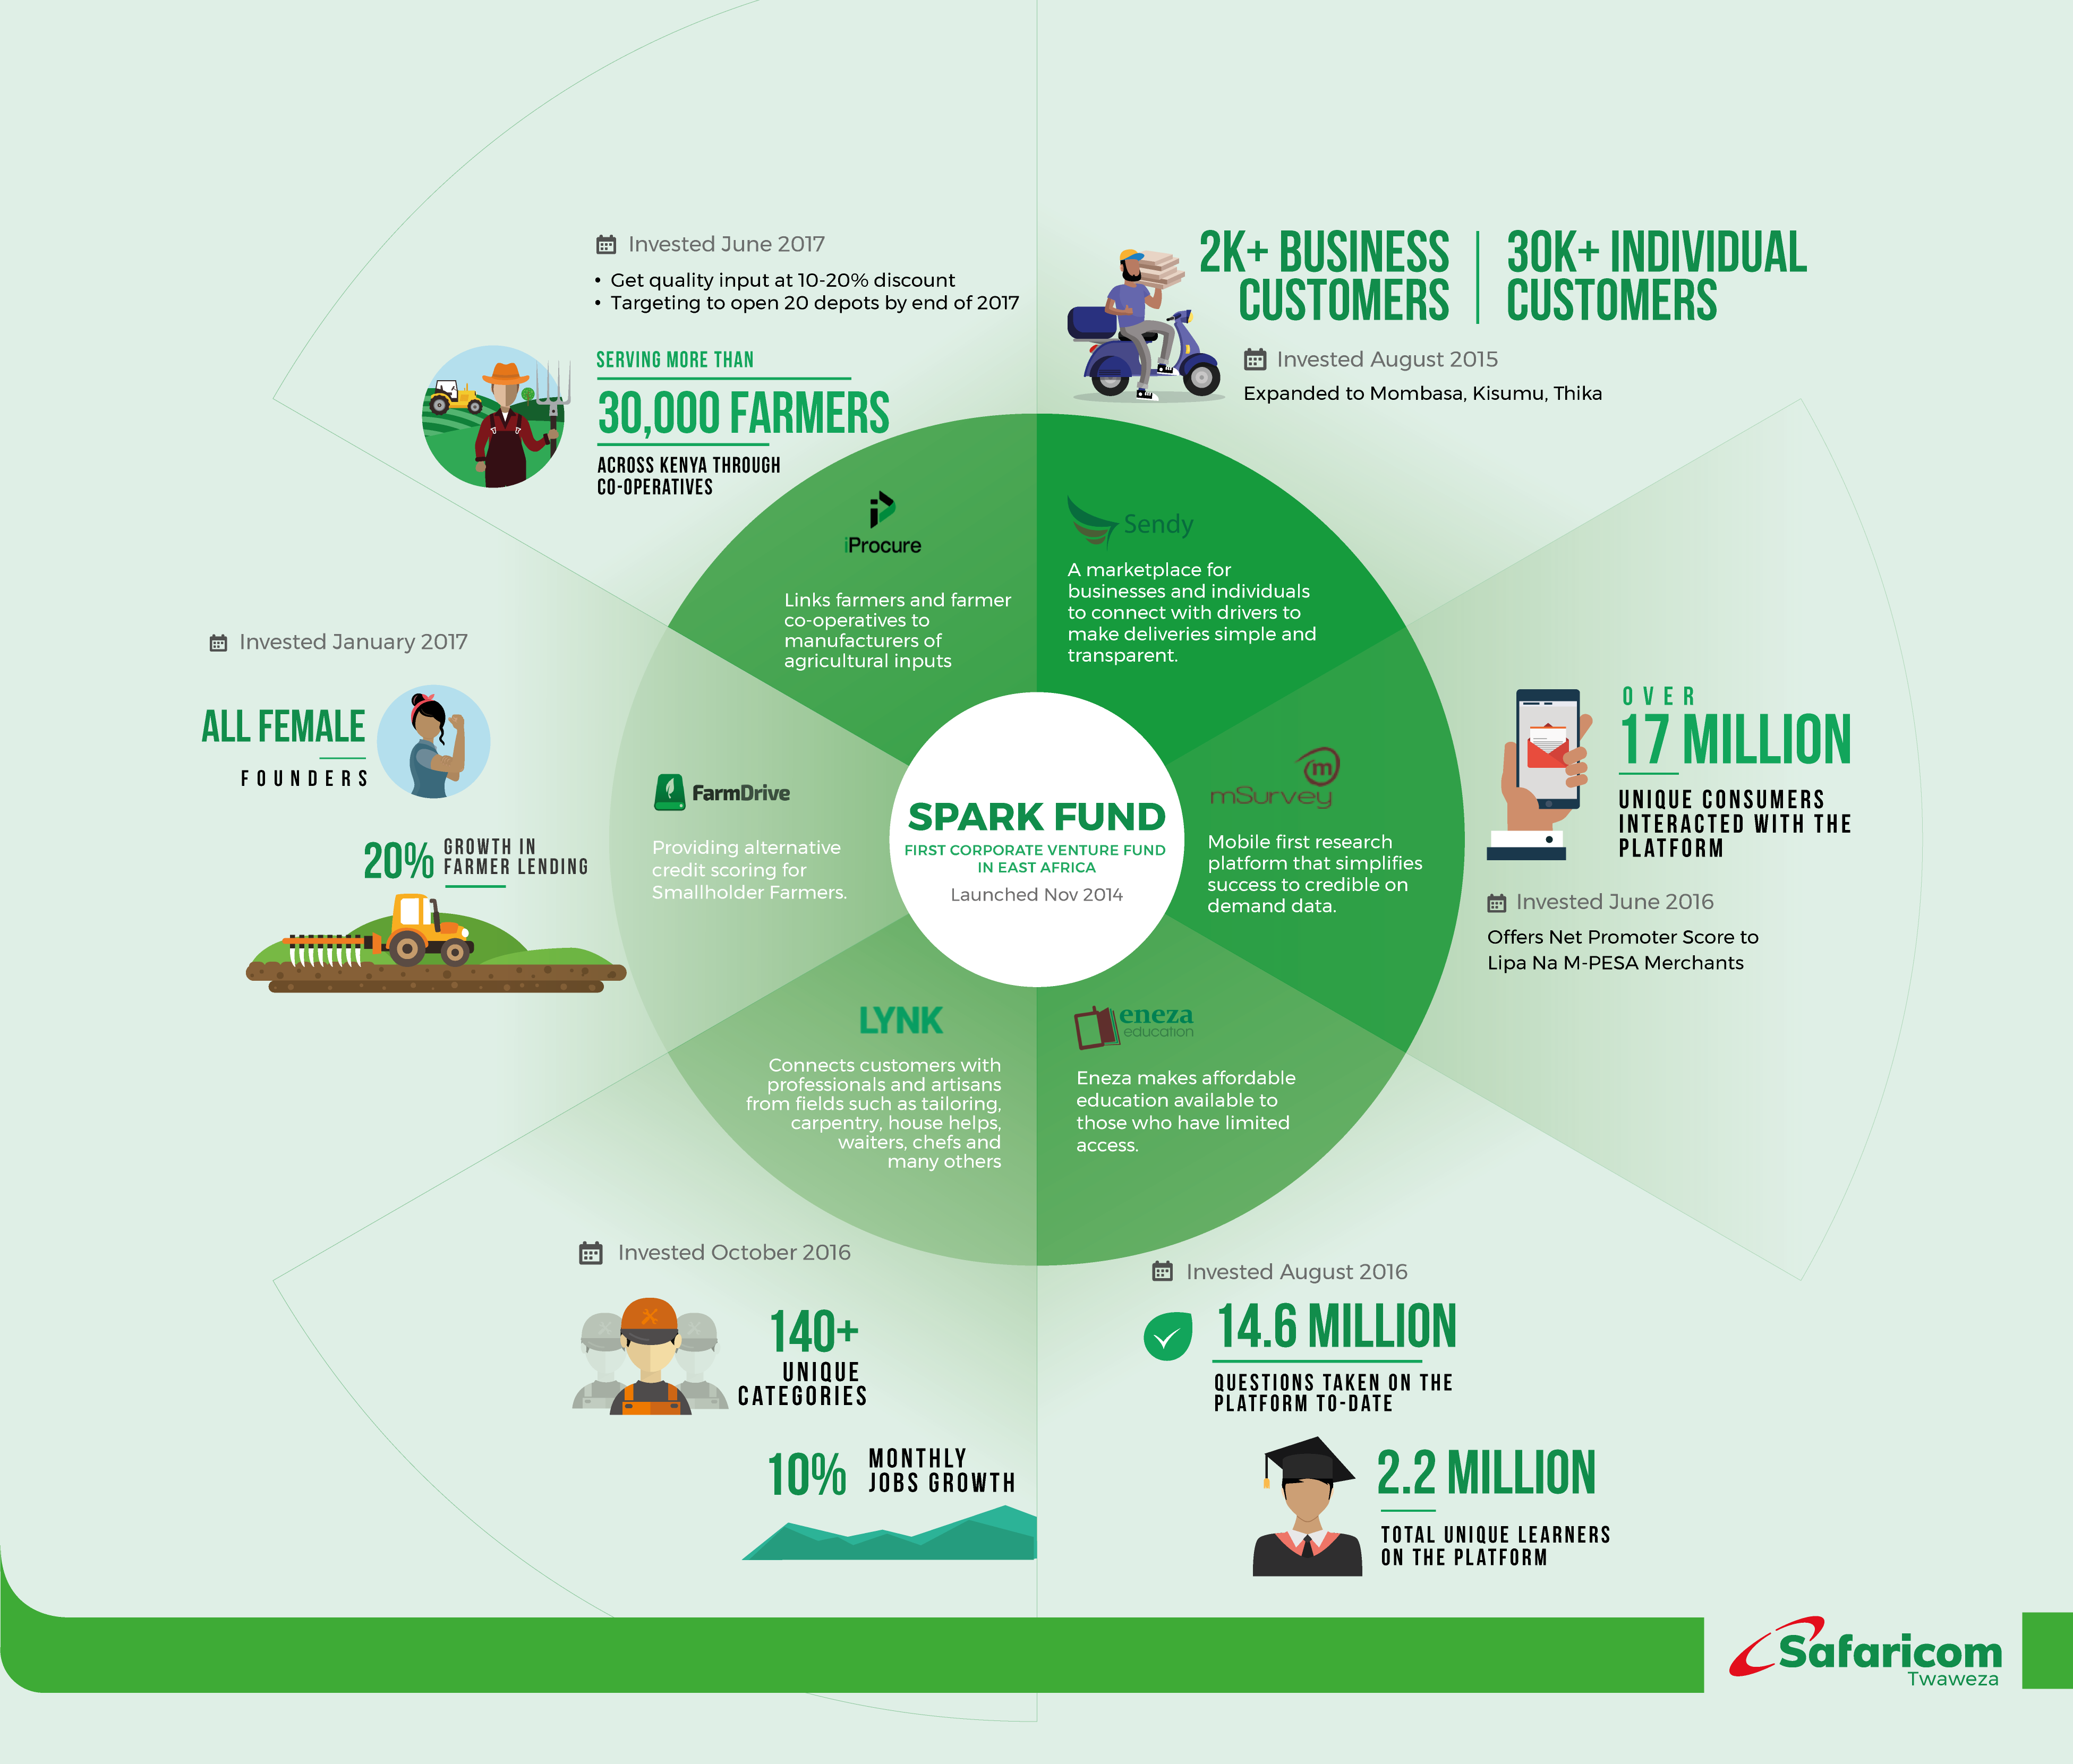 Safaricom Spark Fund investit dans sa sixième start-up